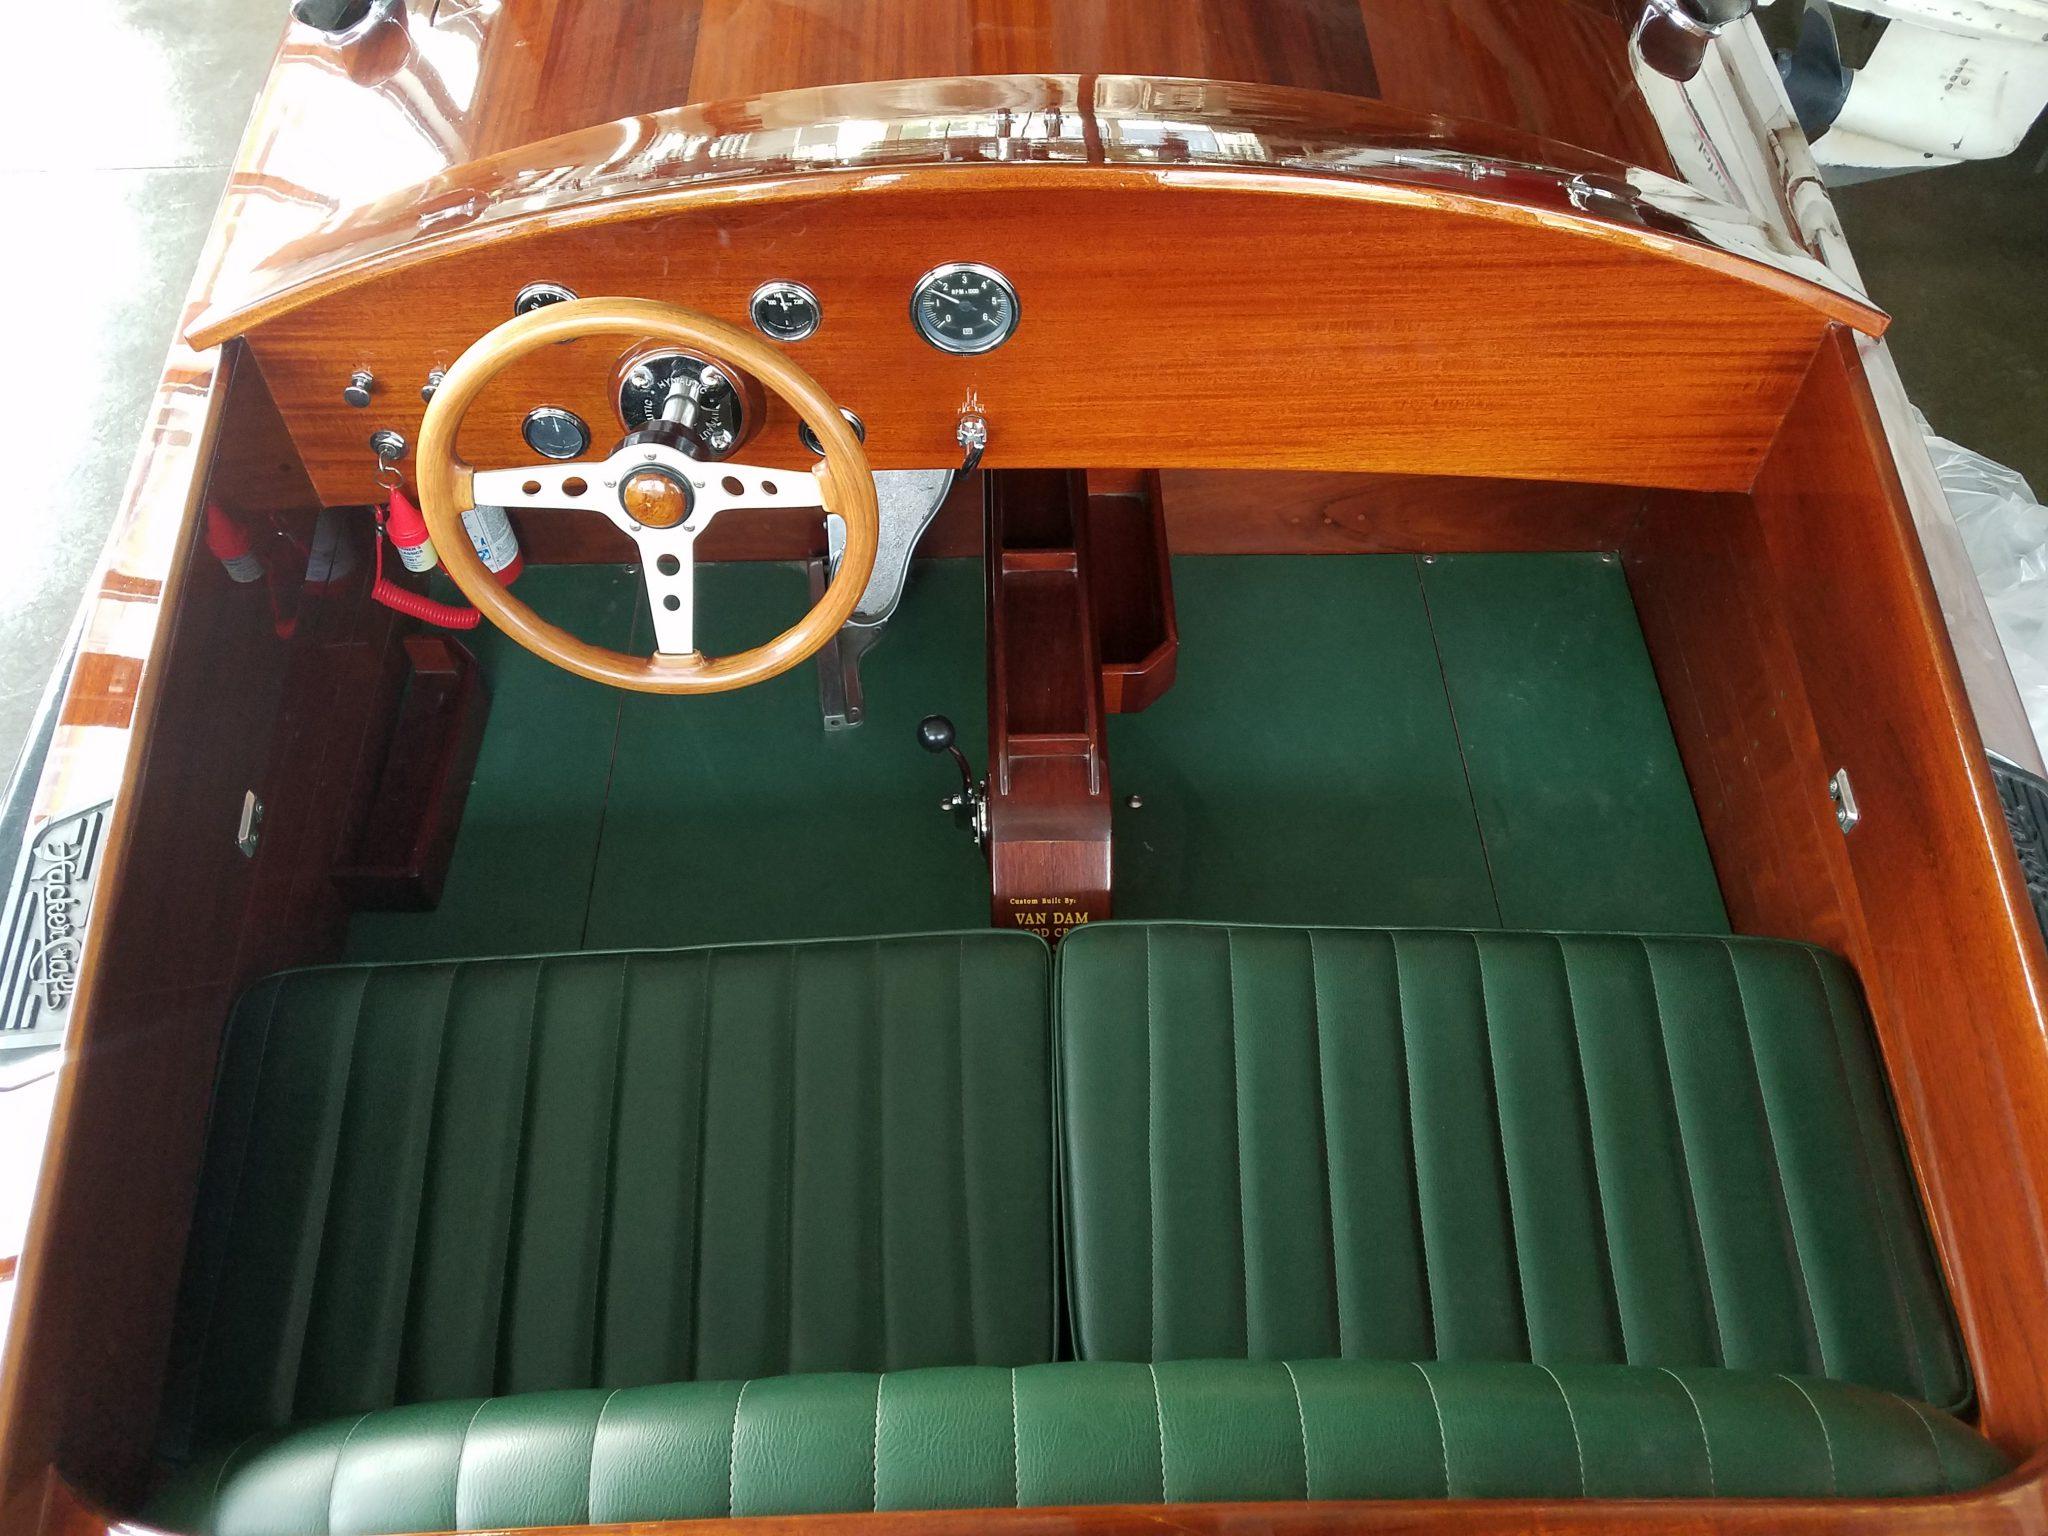 Fine leather seats